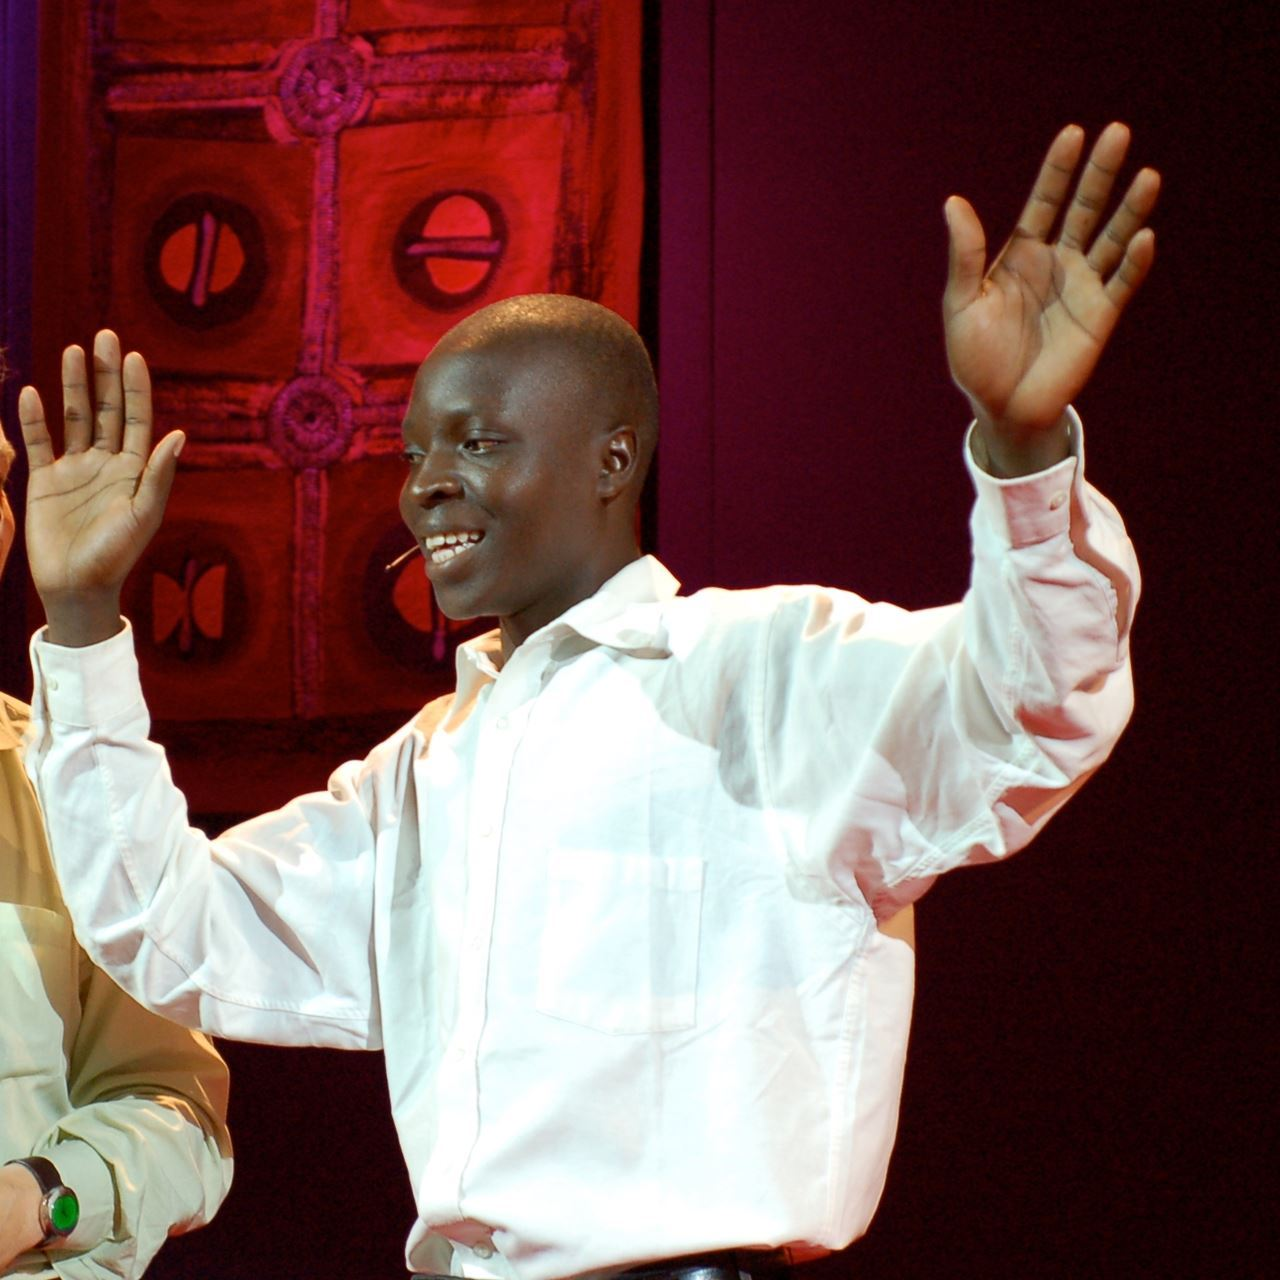 Erik (HASH) Hersman from Orlando (William Kamkwamba) [CC BY 2.0], via Wikimedia Commons